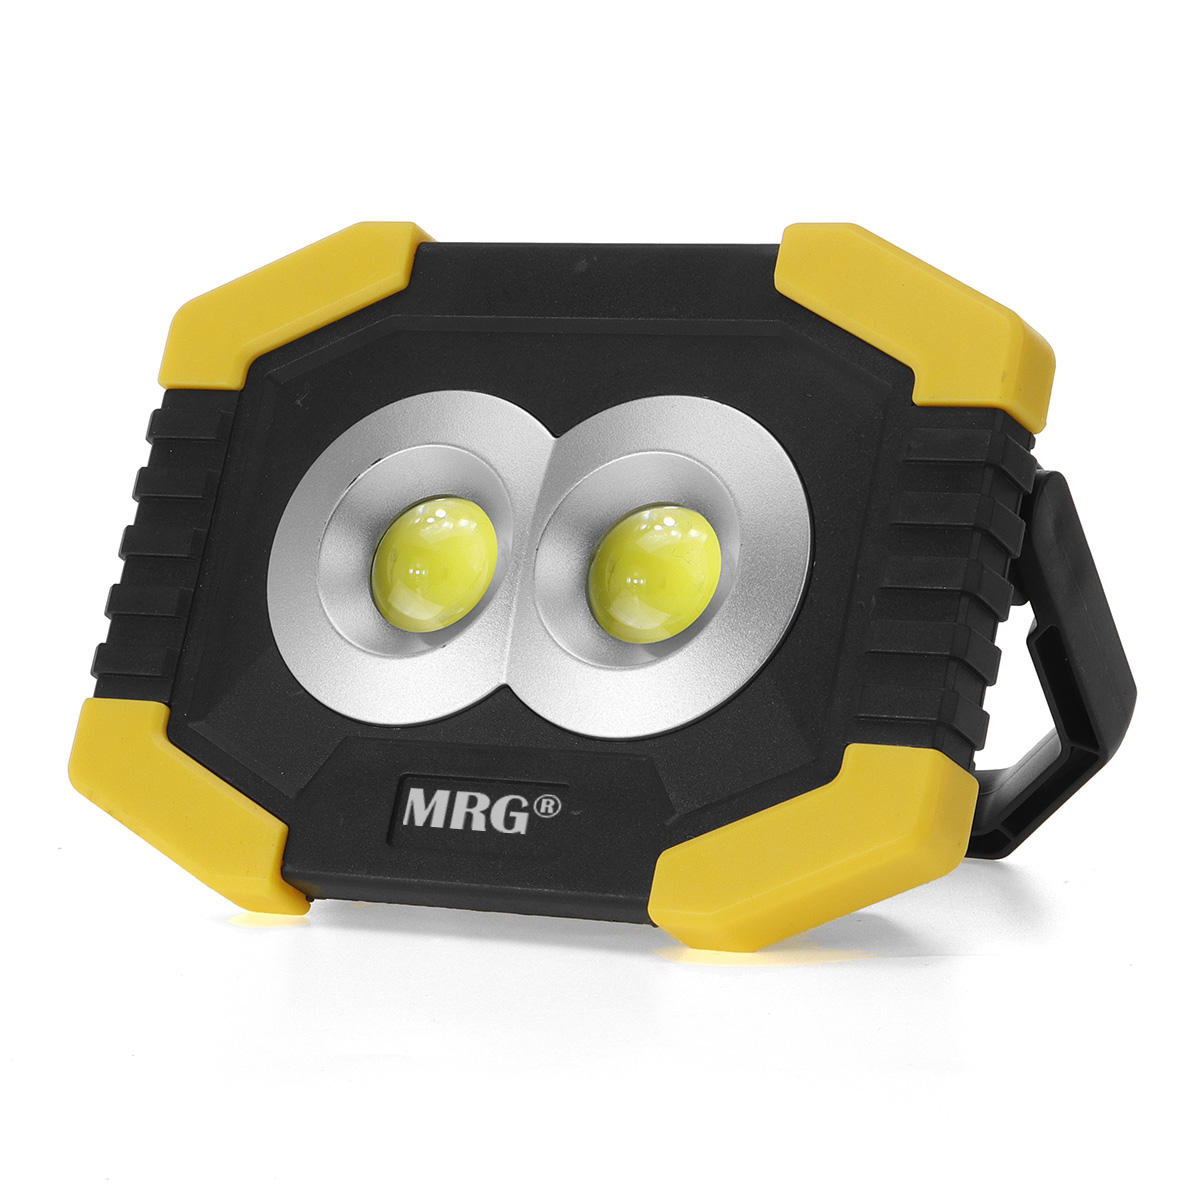 Proiector LED MRG M-T-917B, Portabil, Cu baterii, Cu lanterna